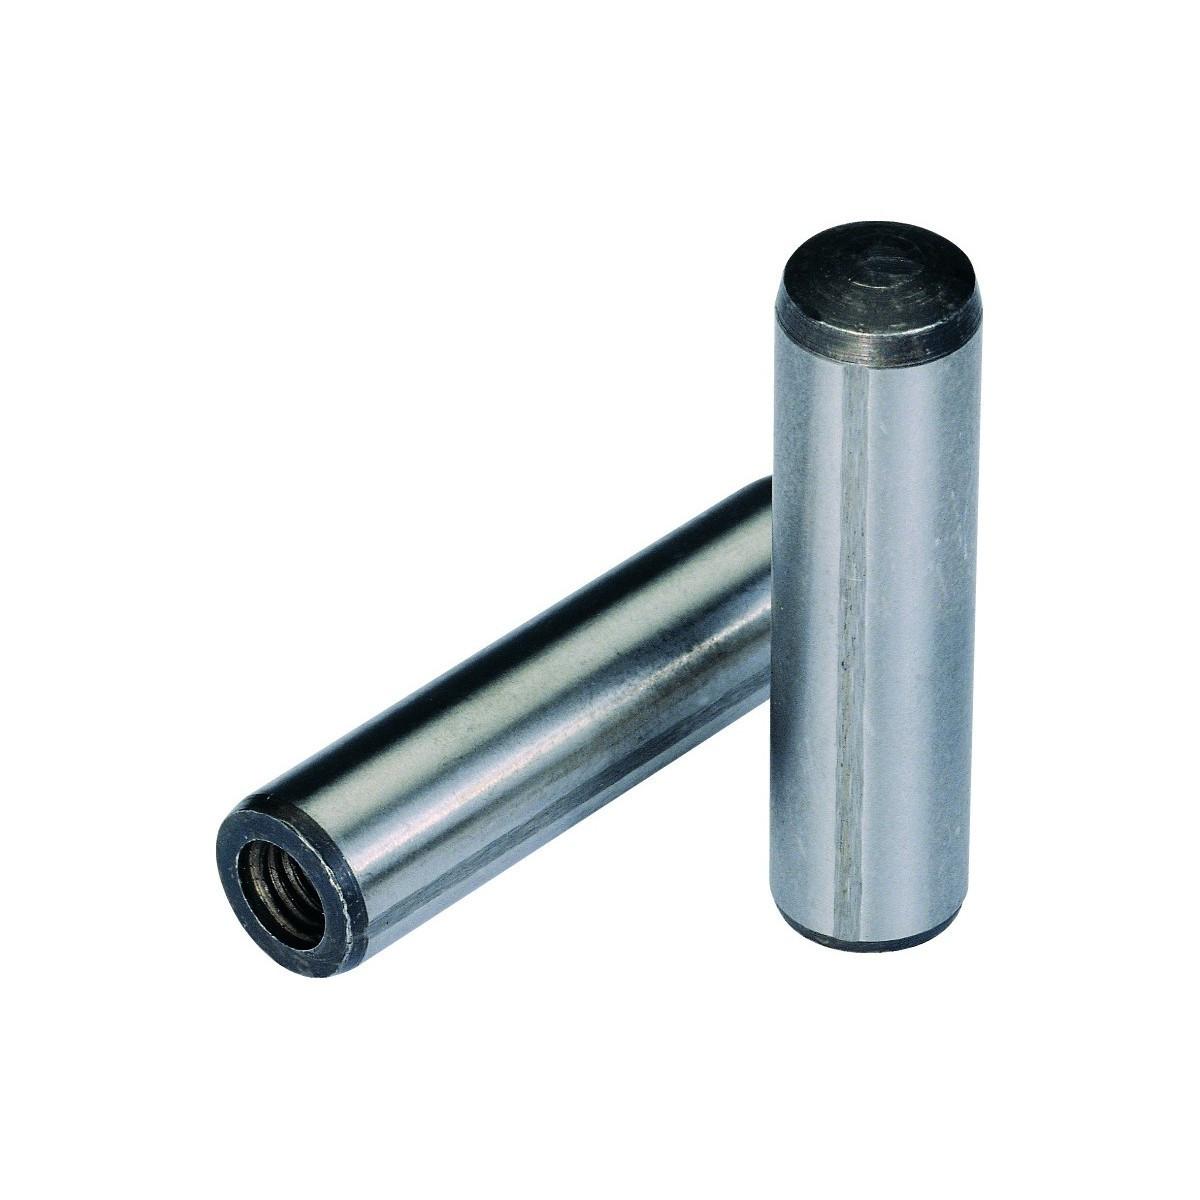 Штифт цилиндрический MMG  DIN 7979D M16 х 70 Класс 10.9 (Фосфат) 1 шт